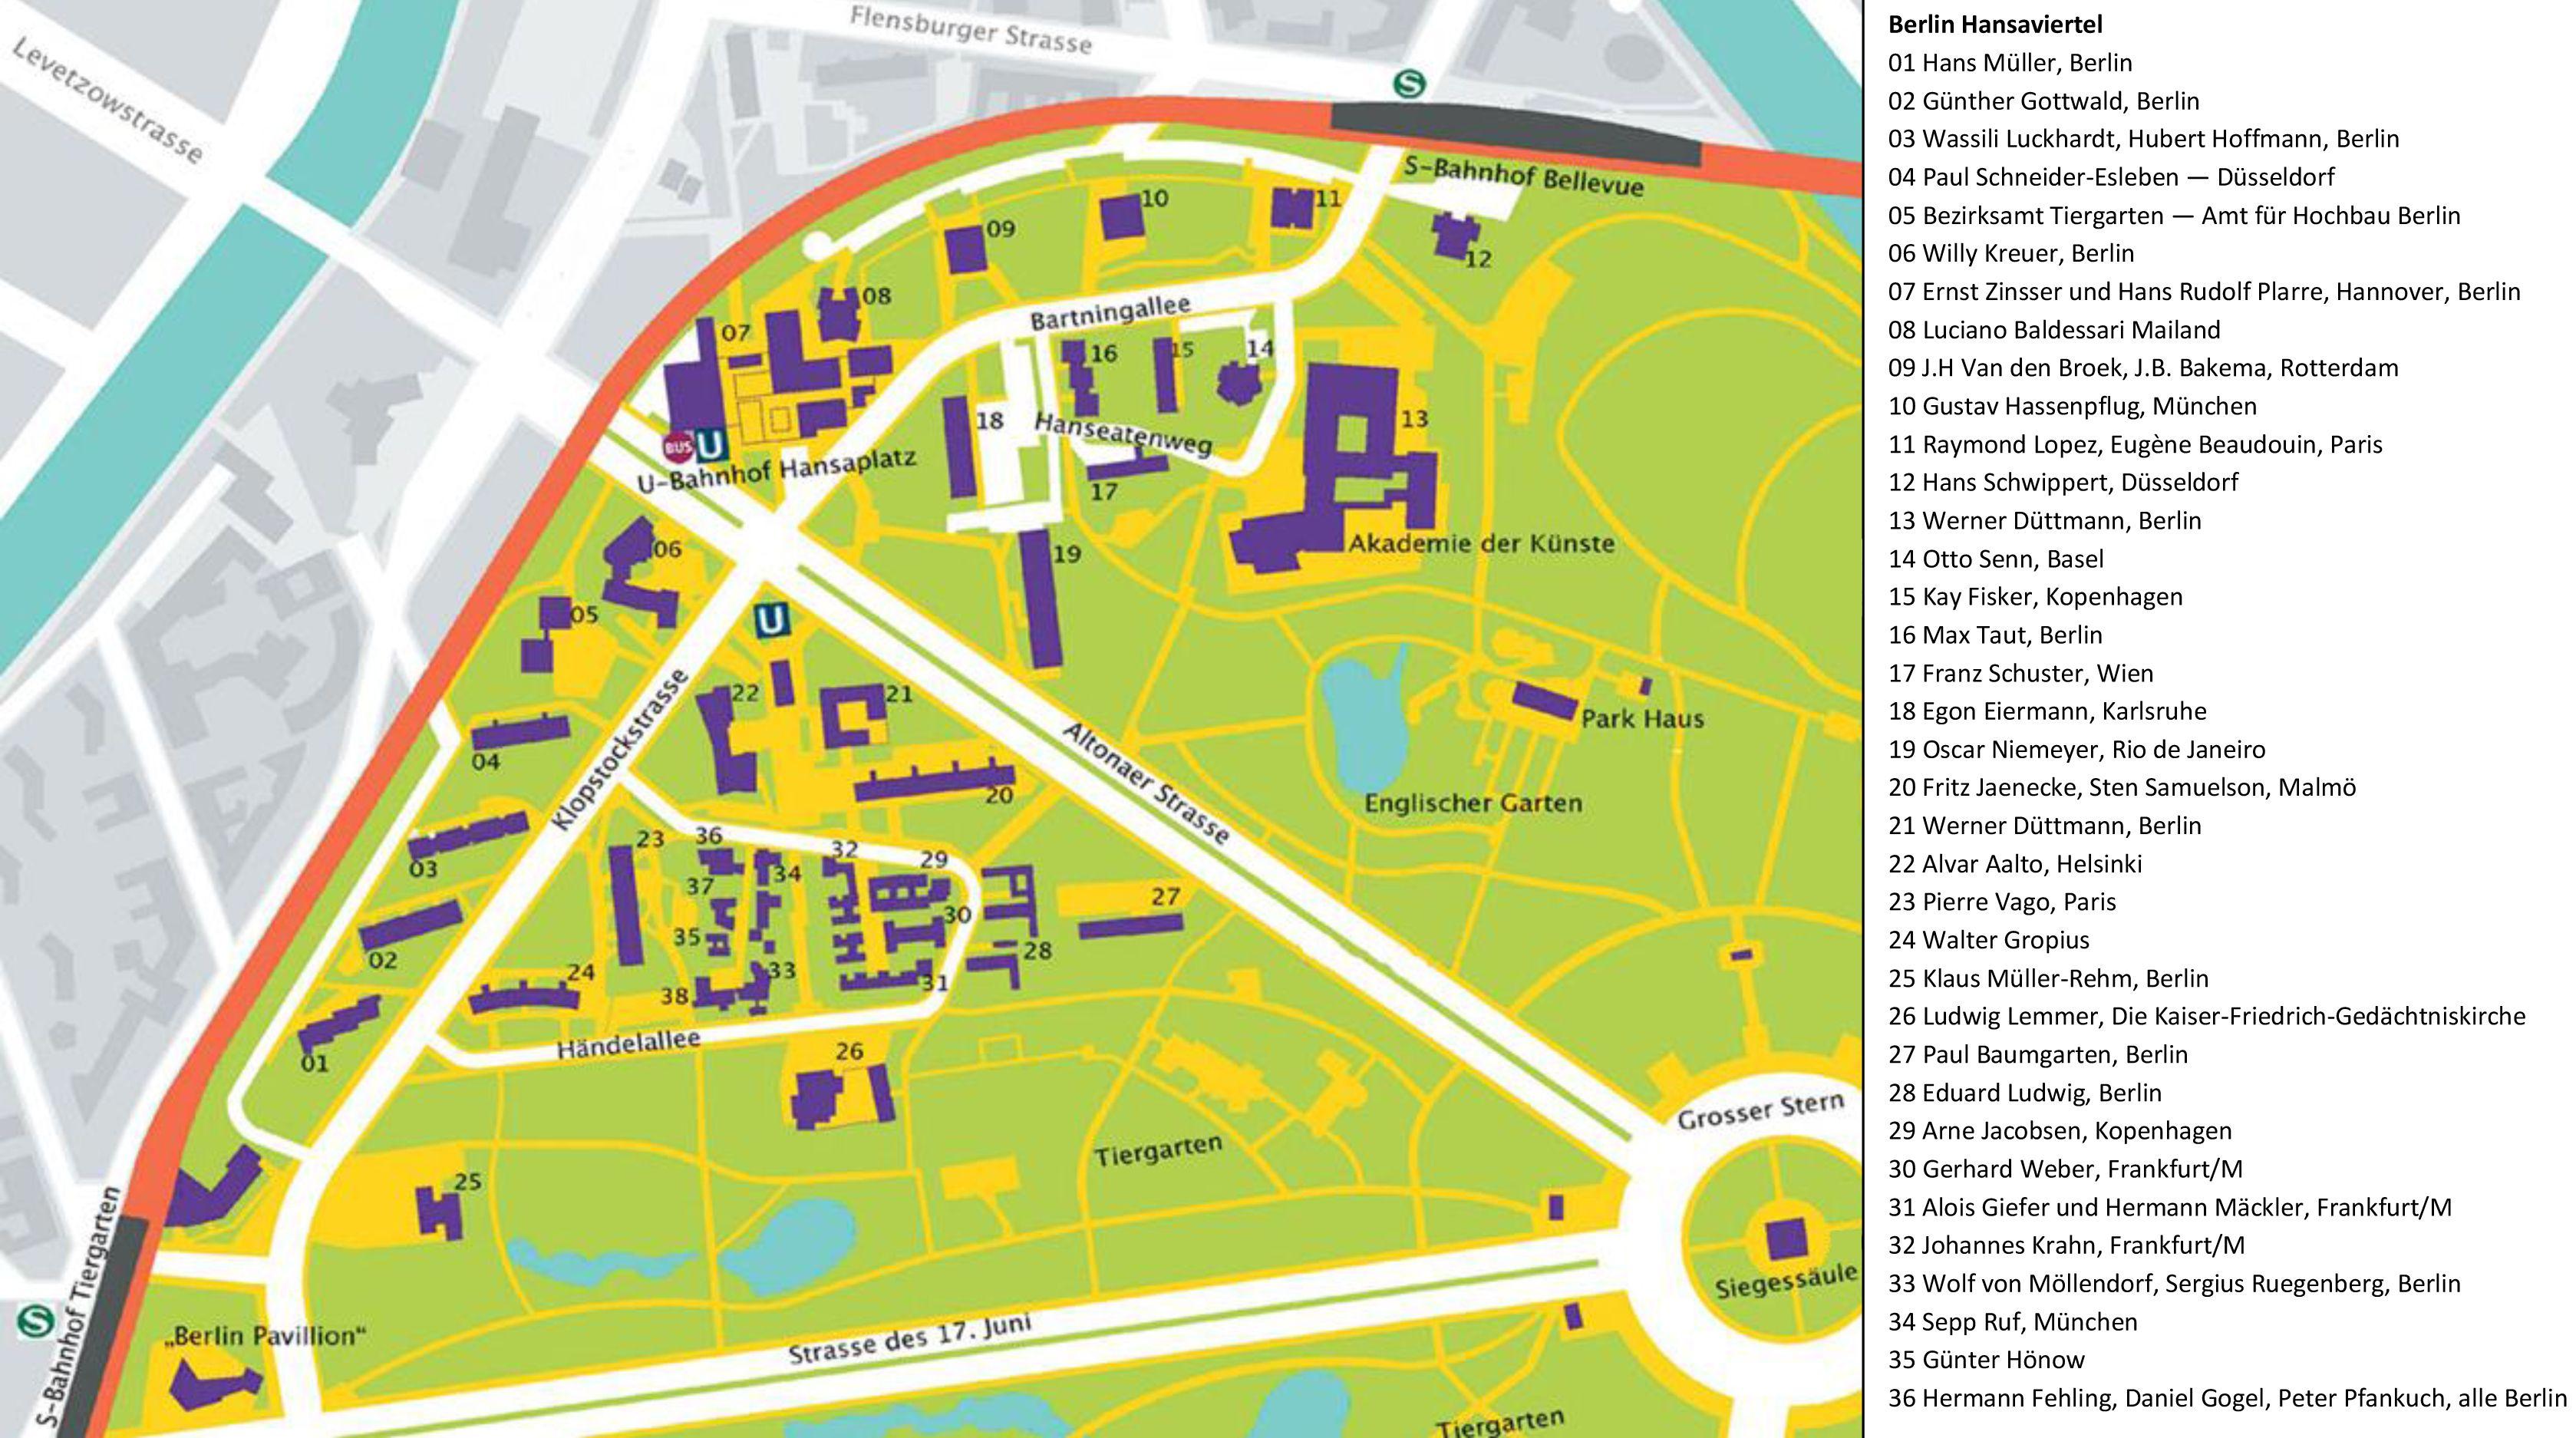 Best Kaart Berlin Hansaviertel